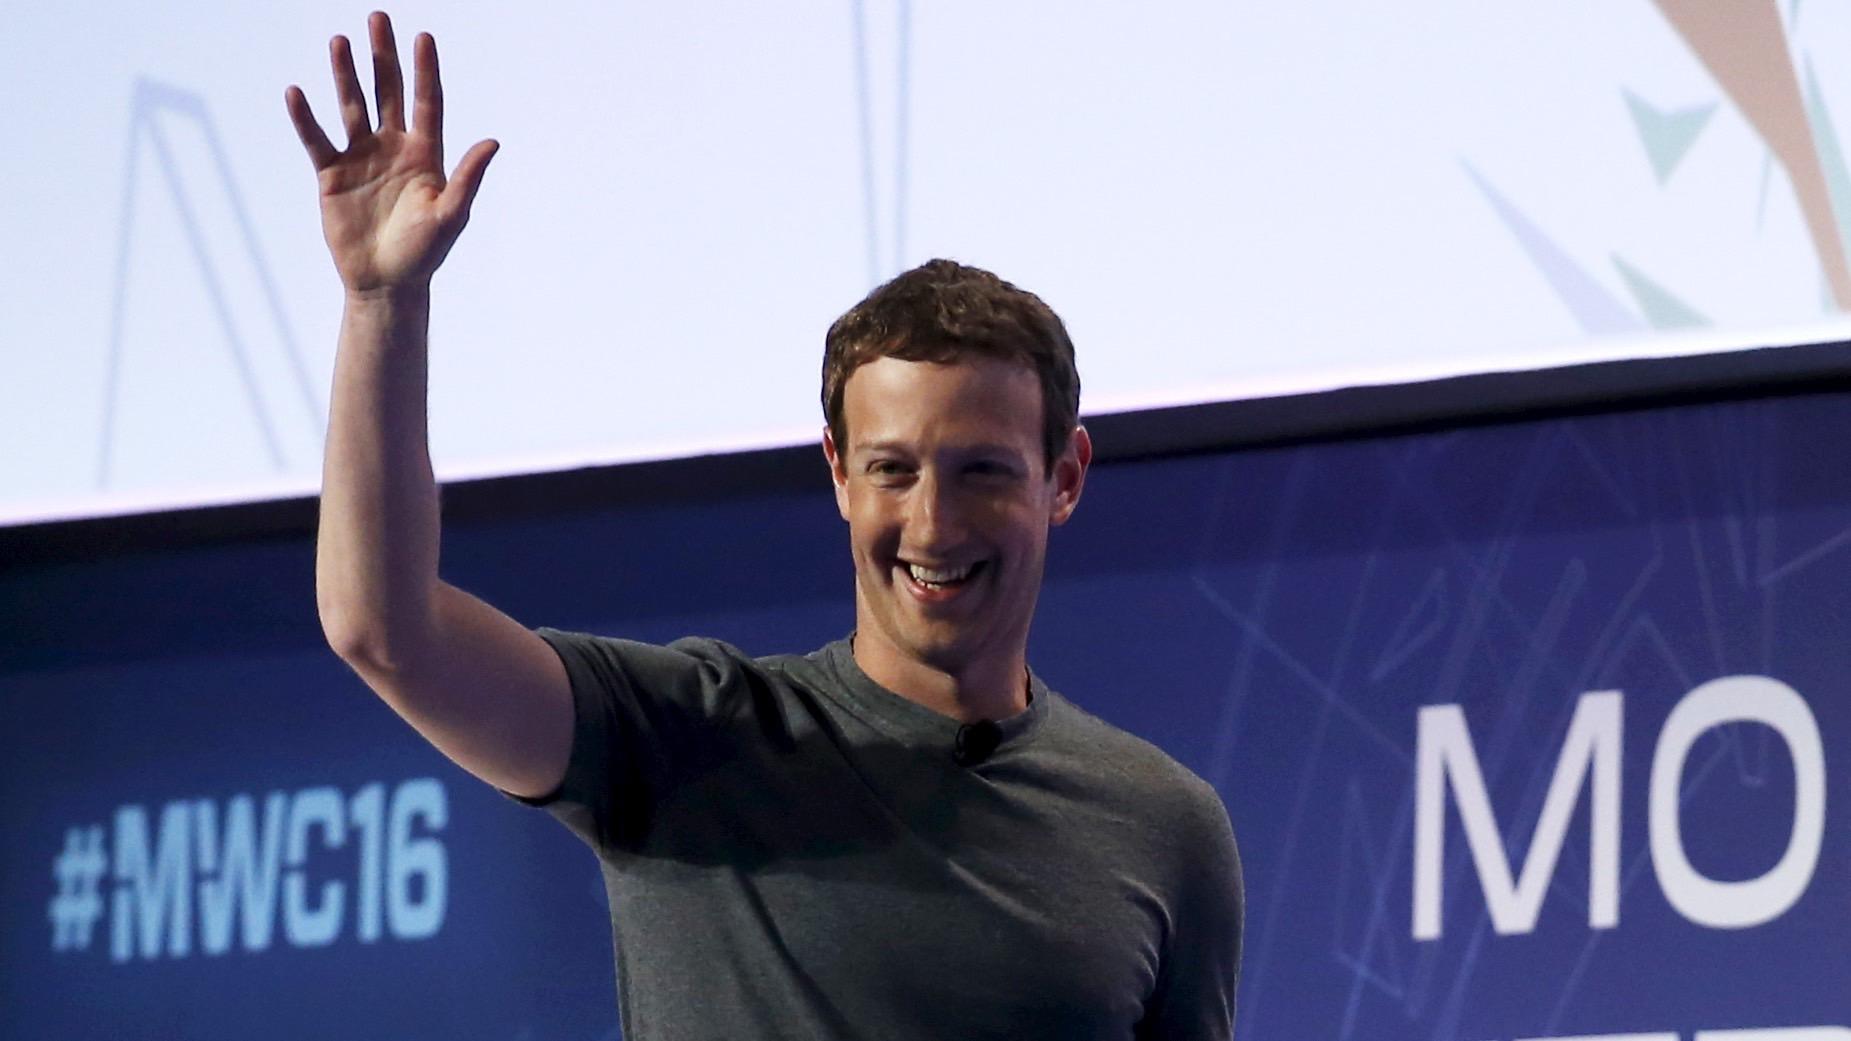 Mark Zuckerberg, founder of Facebook, arrives for a keynote speech during the Mobile World Congress in Barcelona, Spain February 22, 2016. REUTERS/Albert Gea - RTX282J1